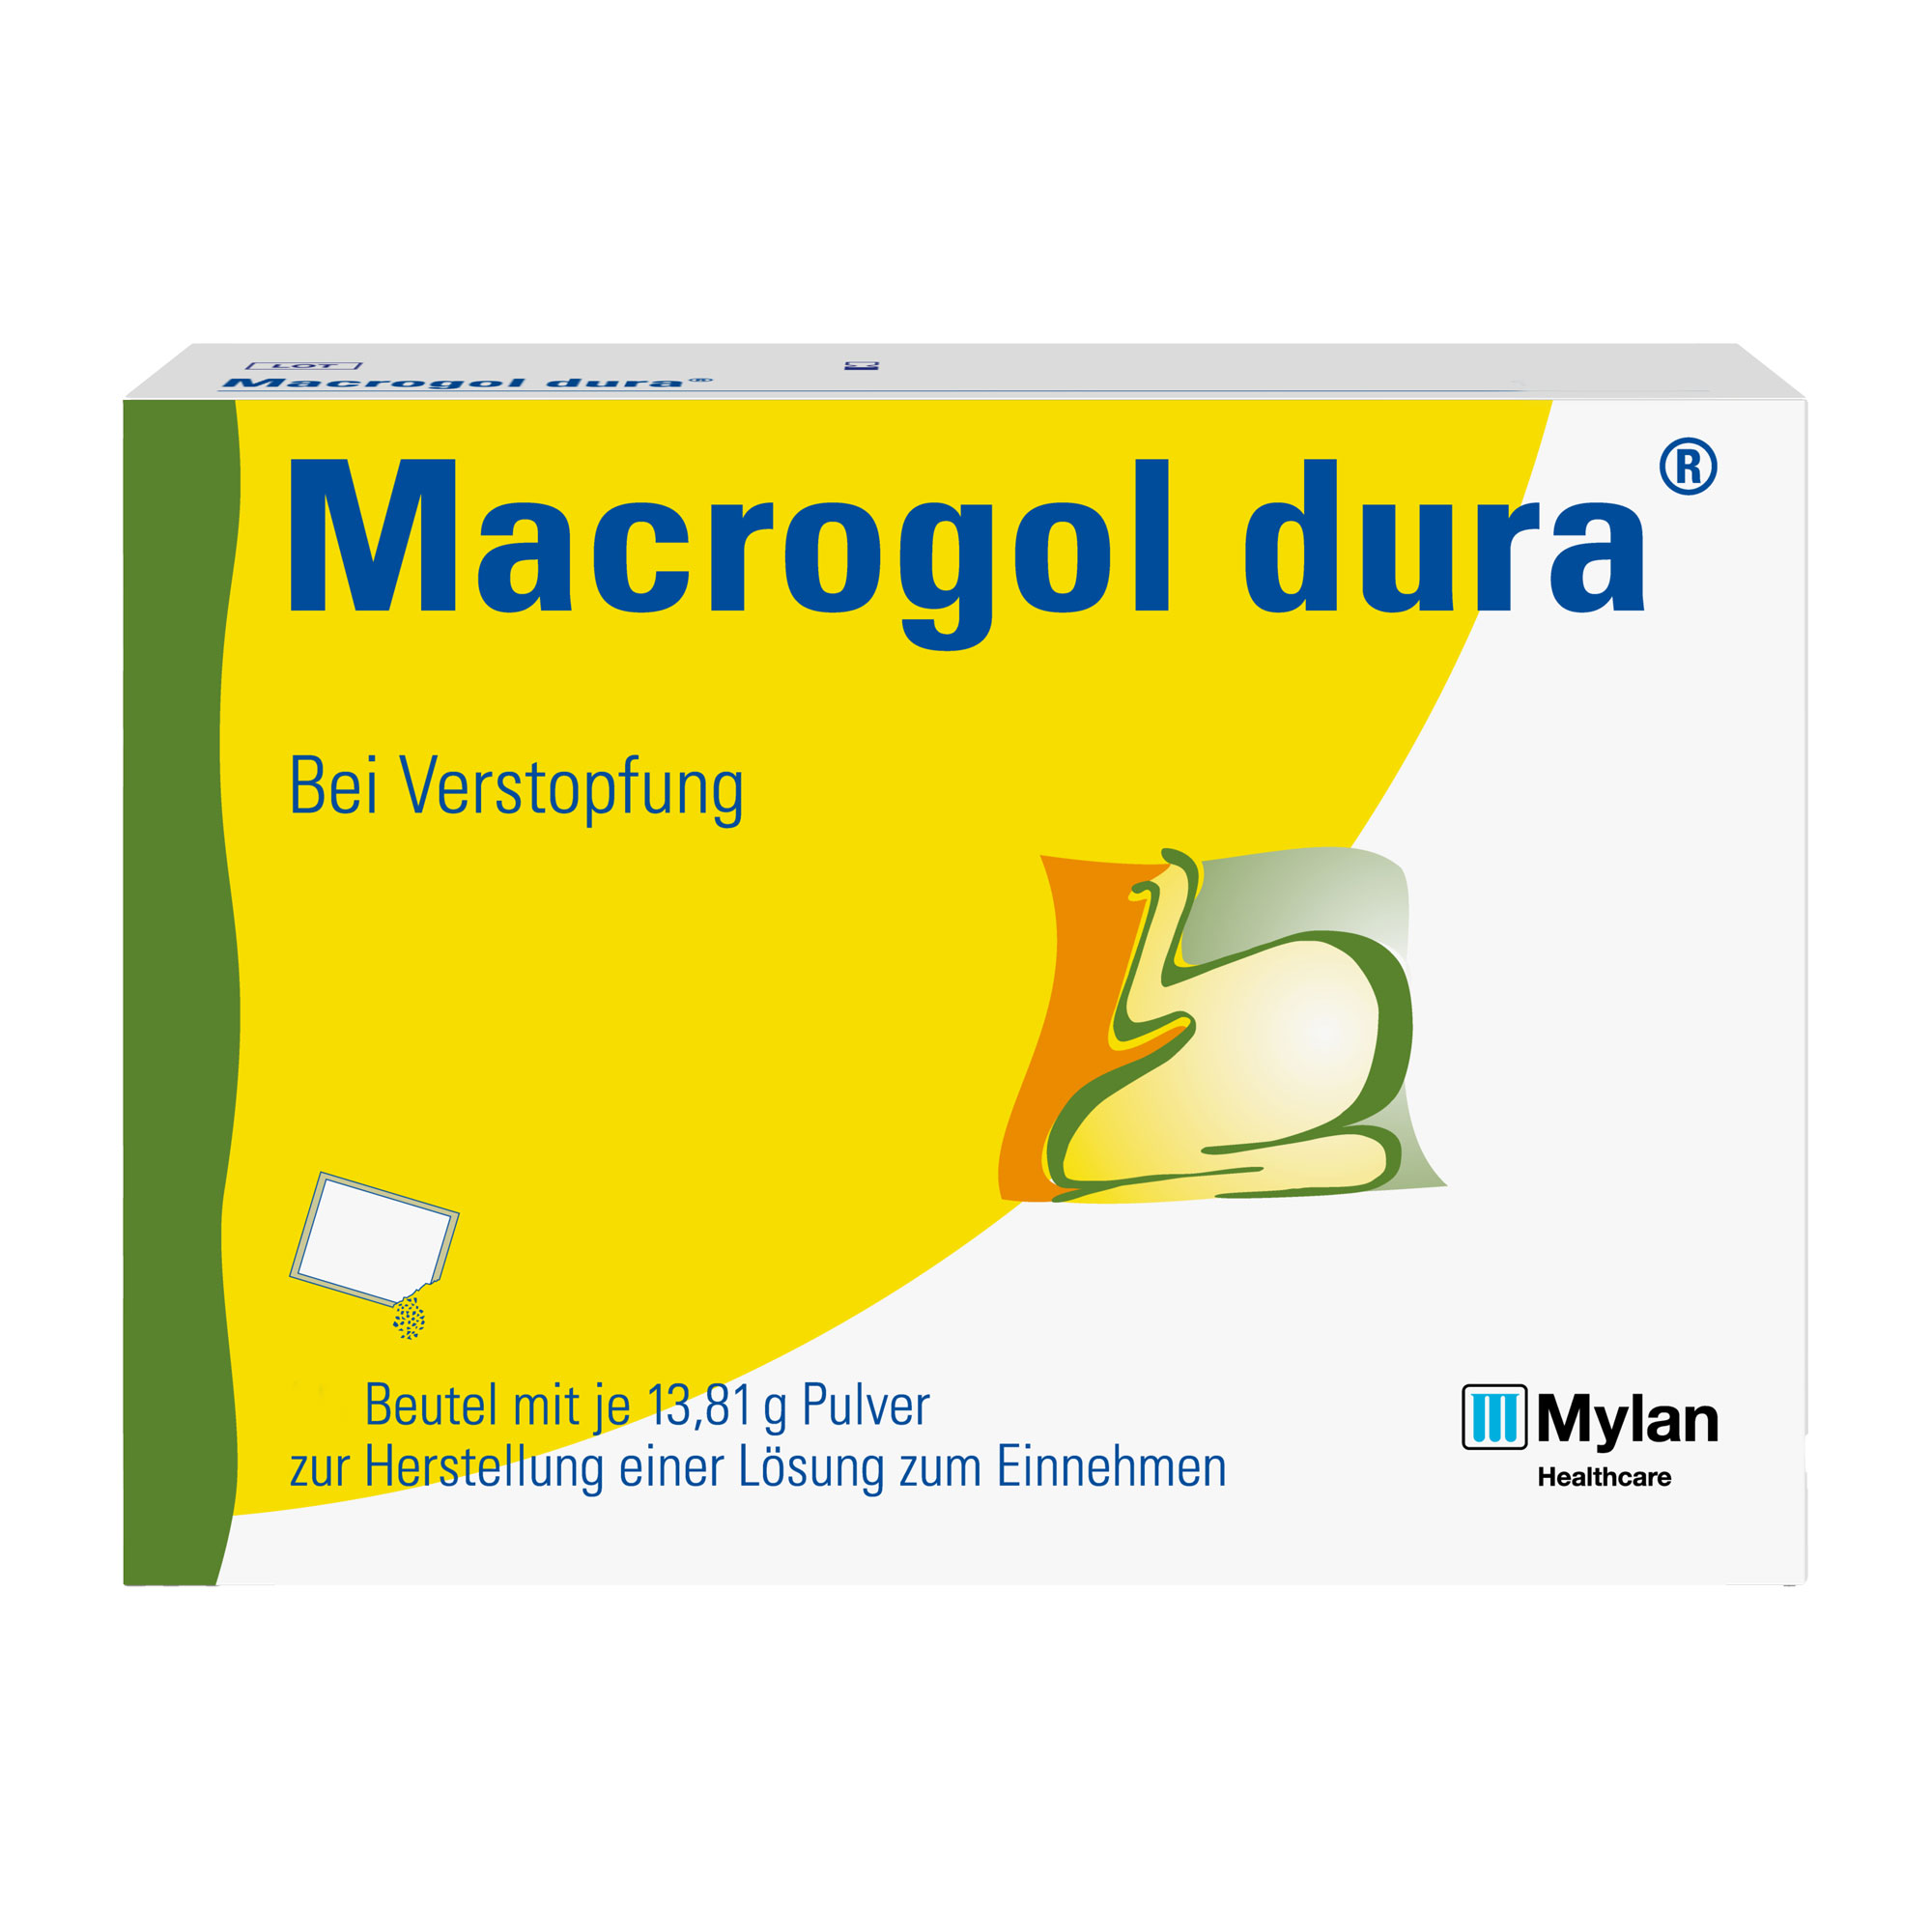 MACROGOL DURA